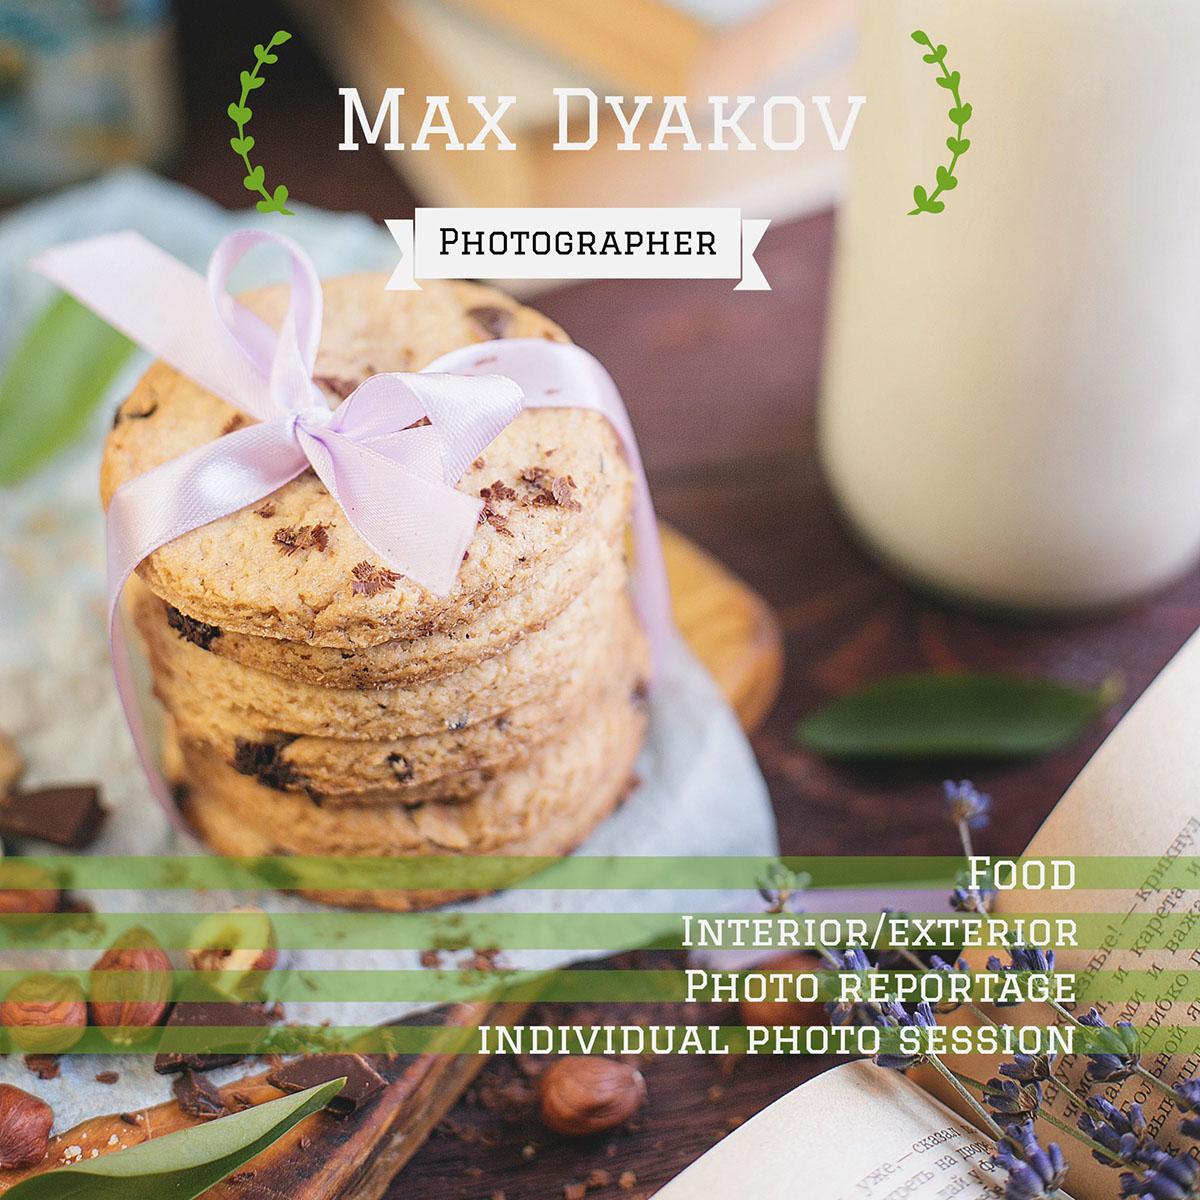 Max Dyakov